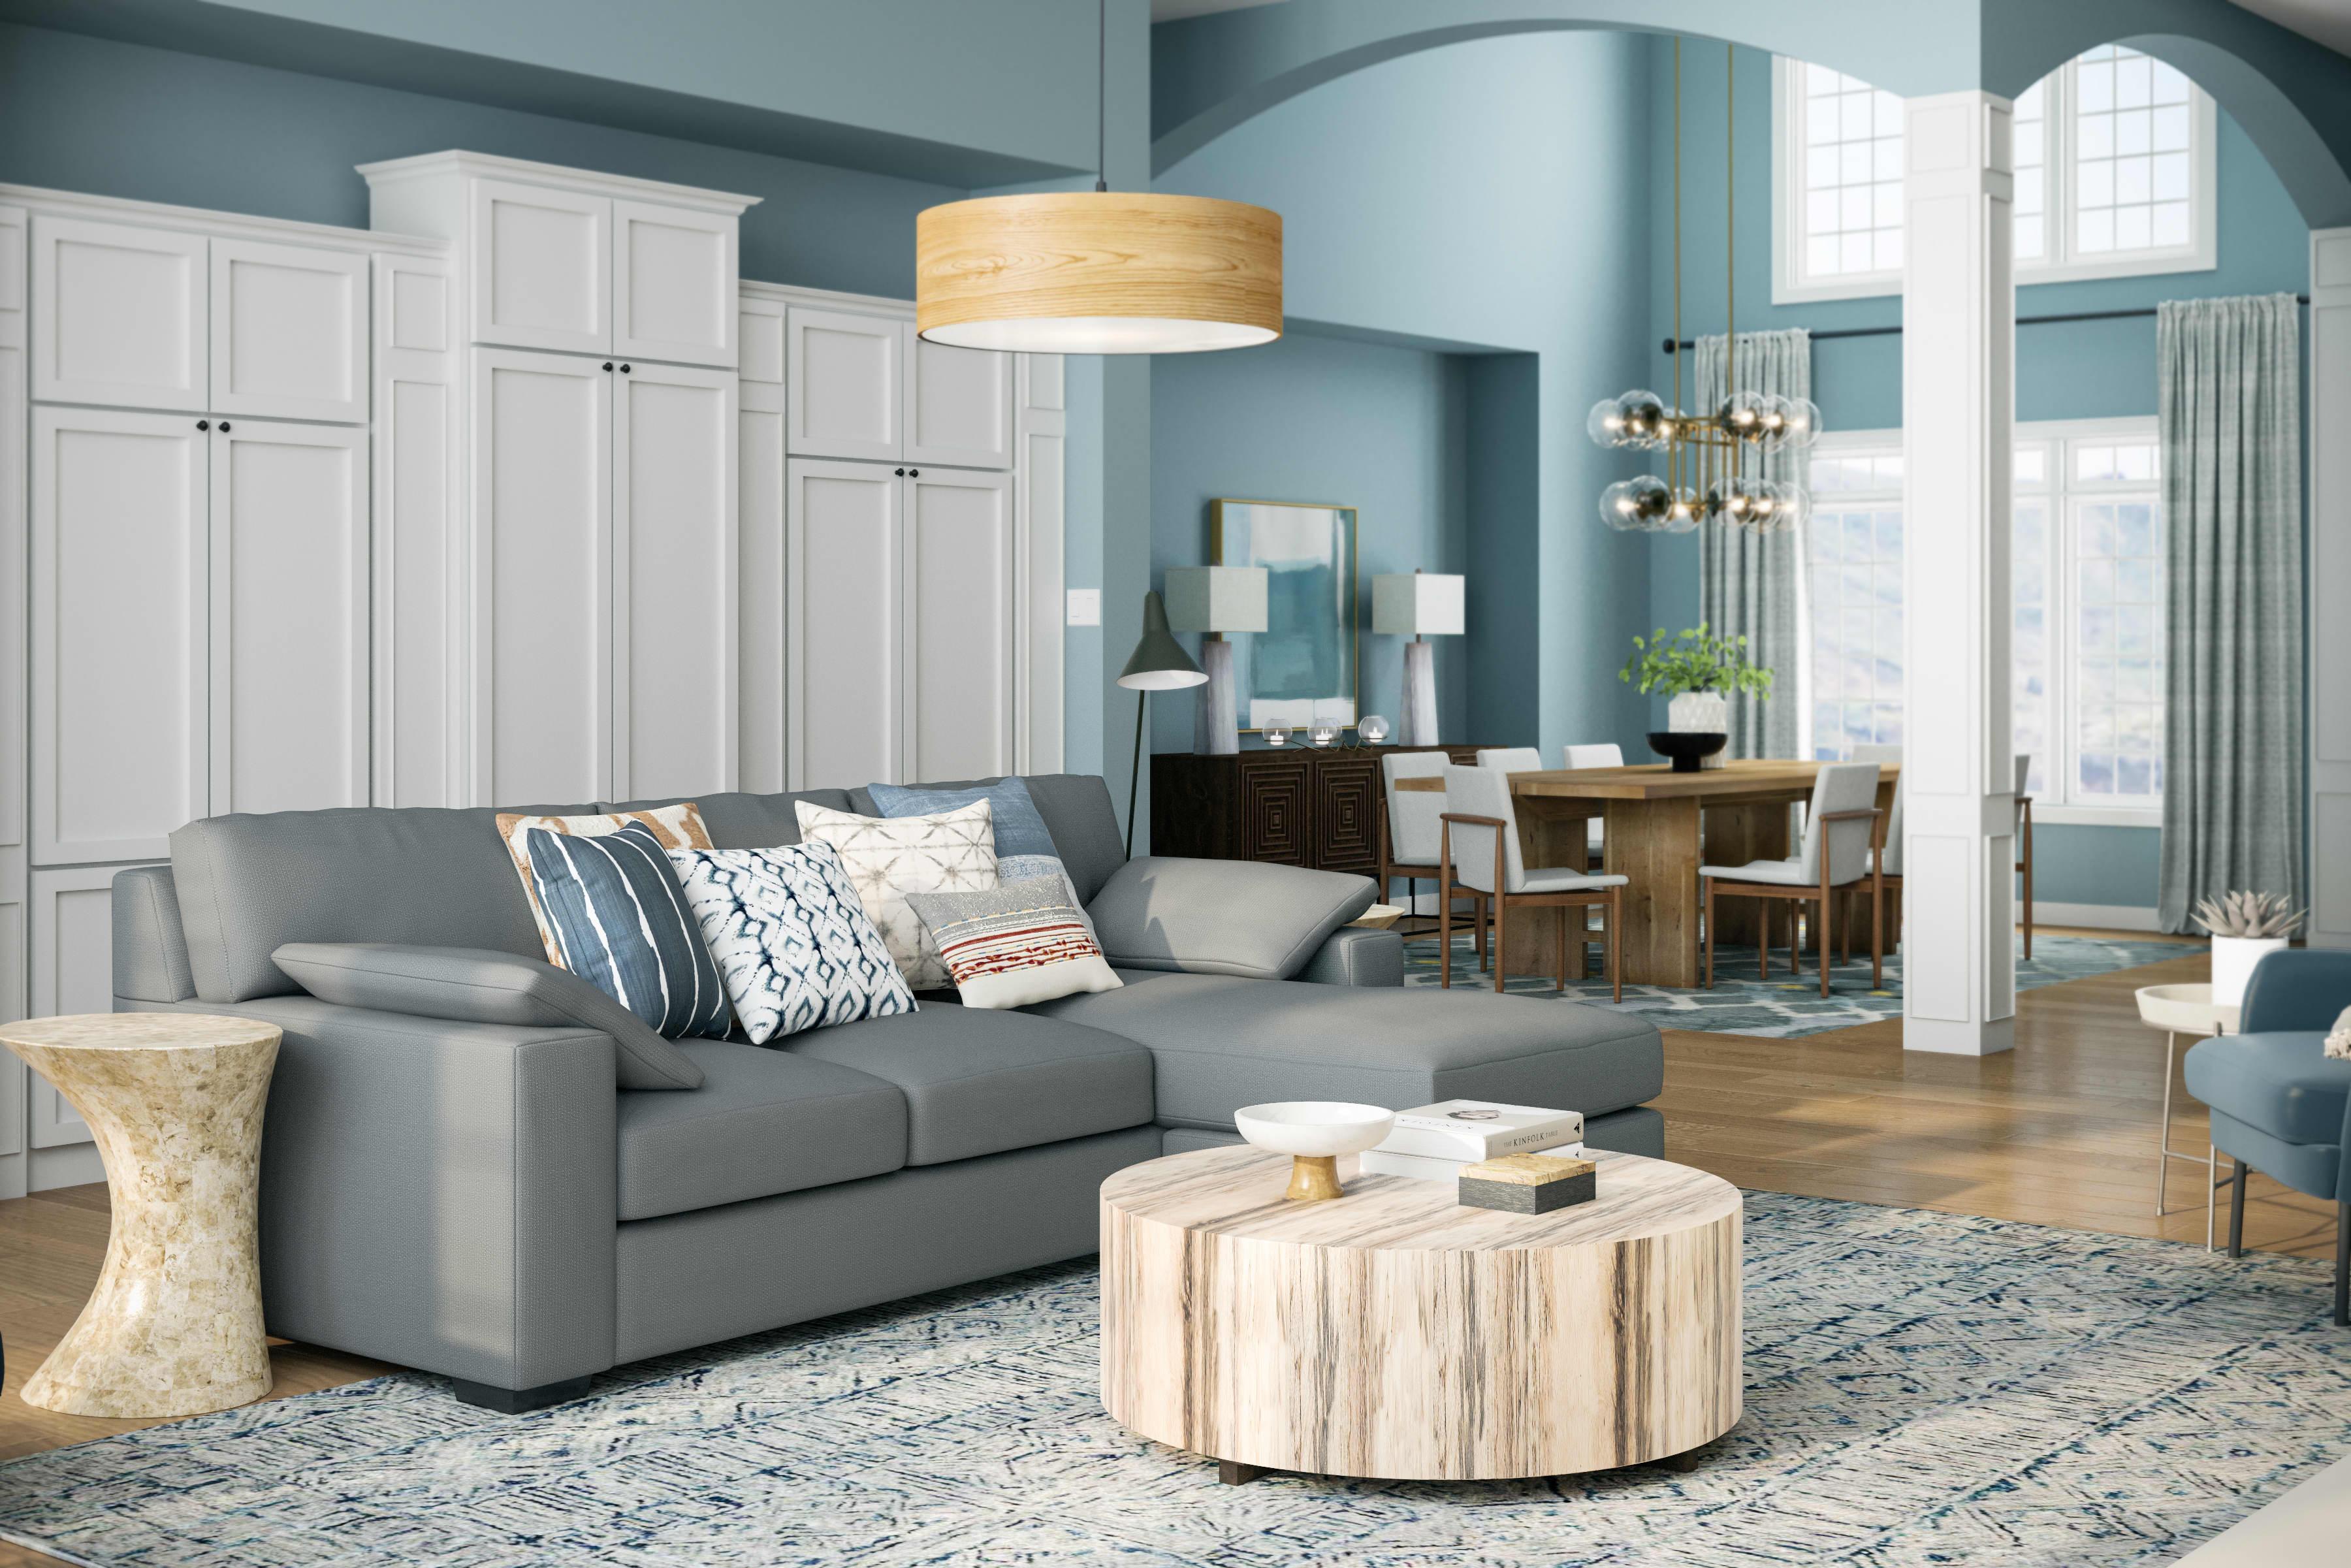 Big Little Lies Set Design Decor 2019 | Apartment Therapy